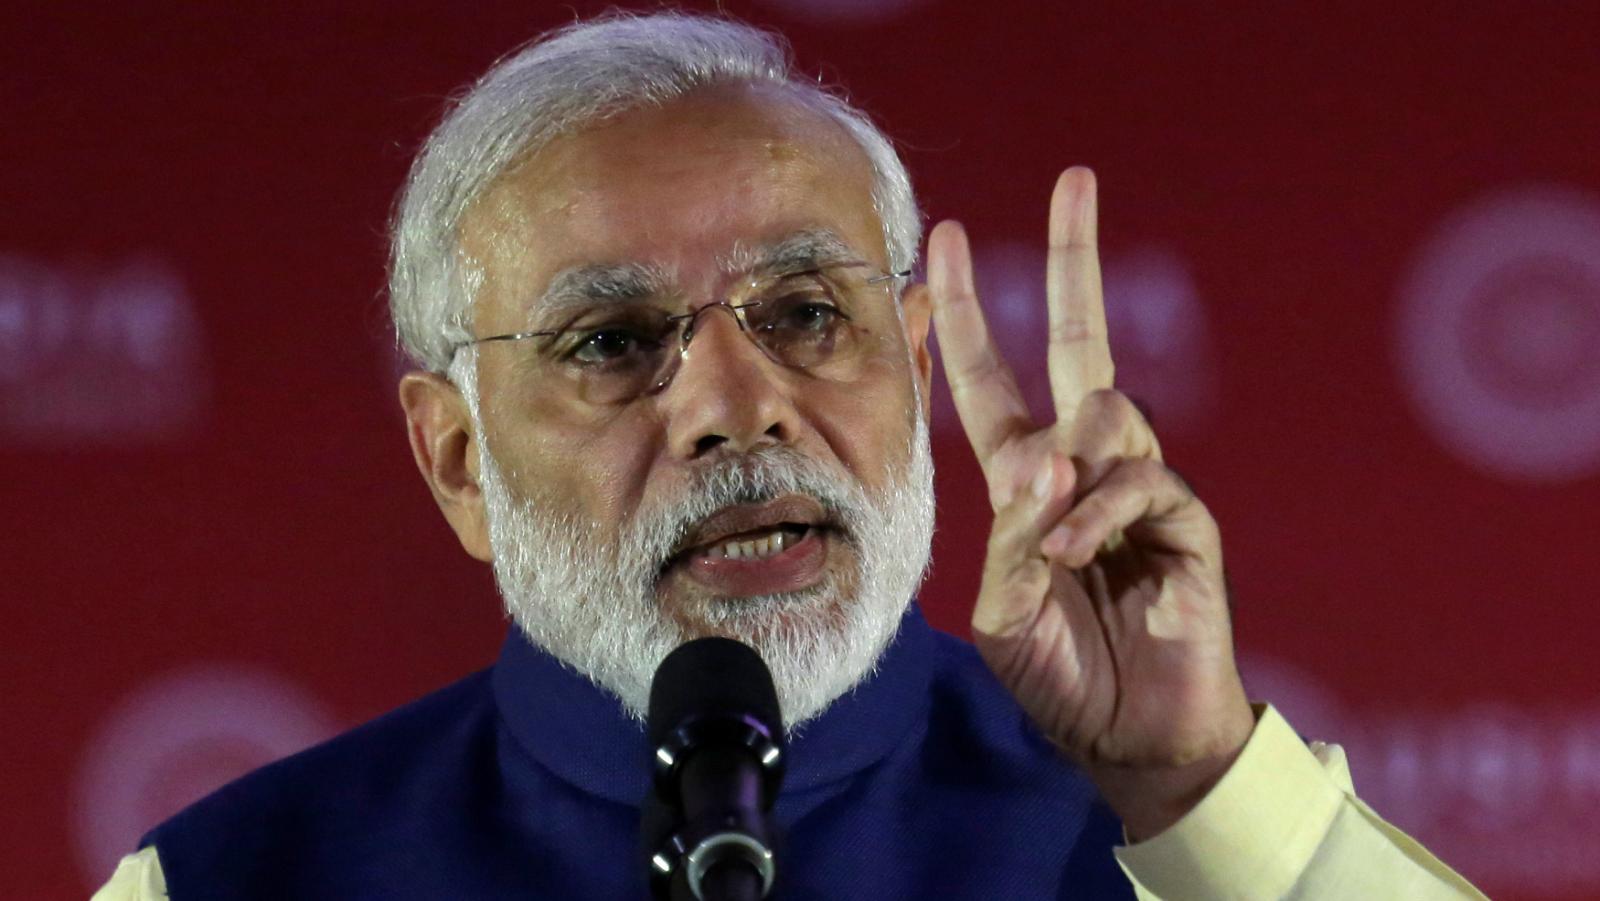 Narendra Modi-CEO-Indian prime minister-Power